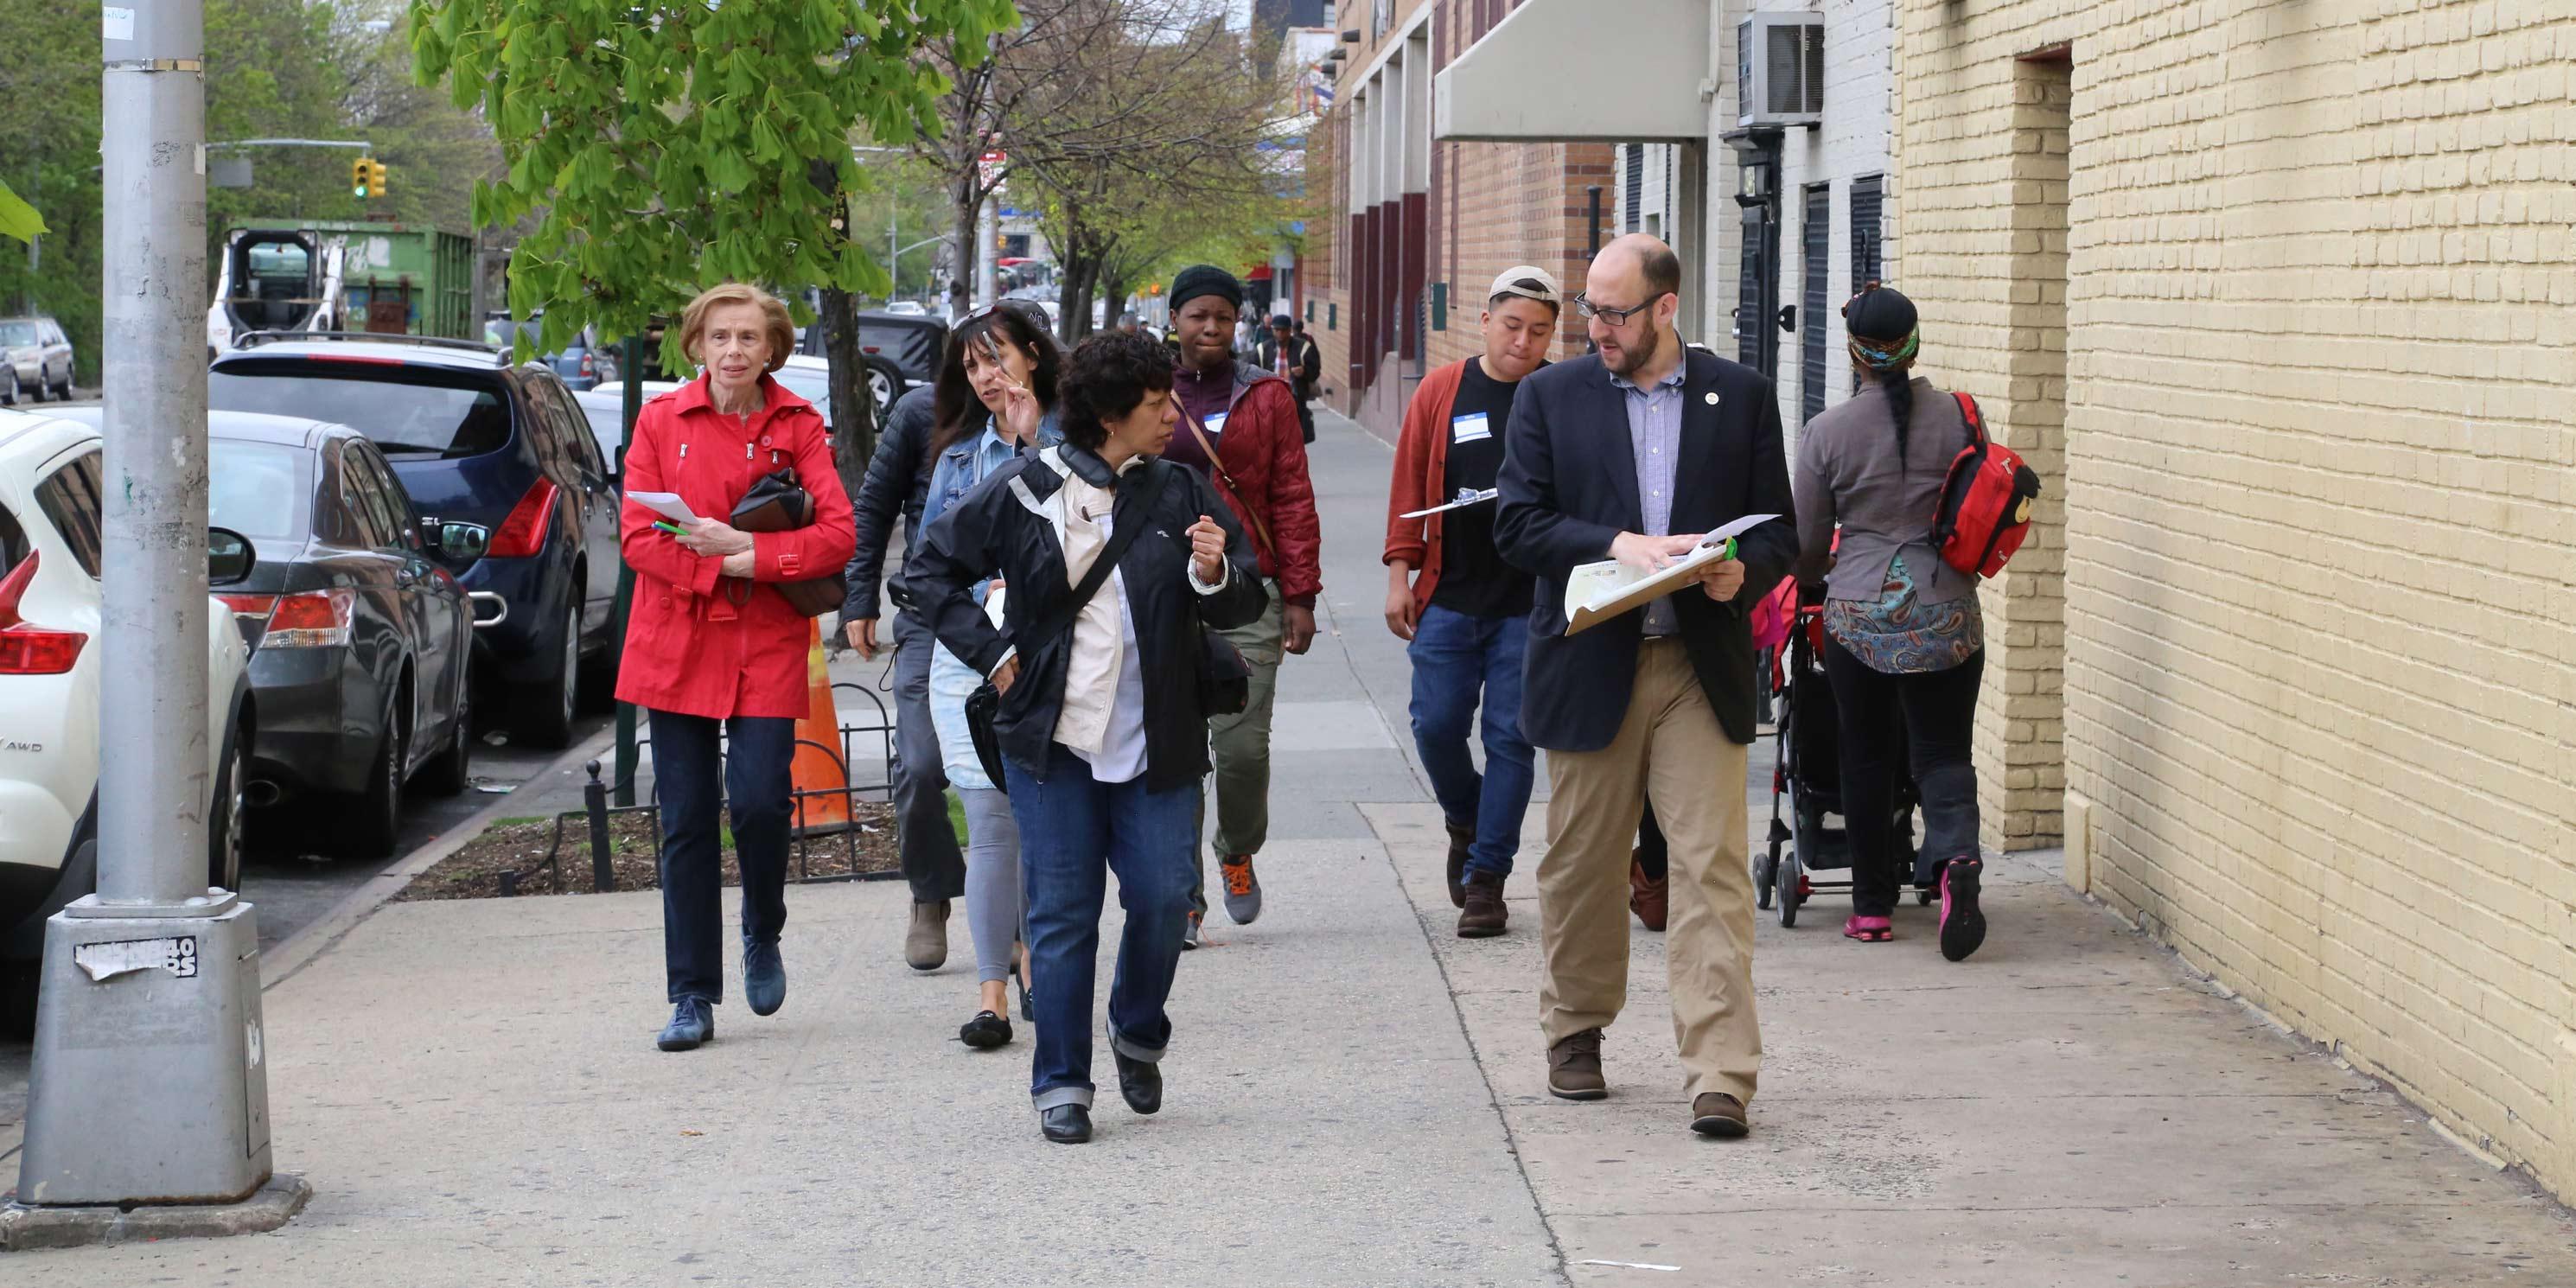 workshop participants walk down sidewalk